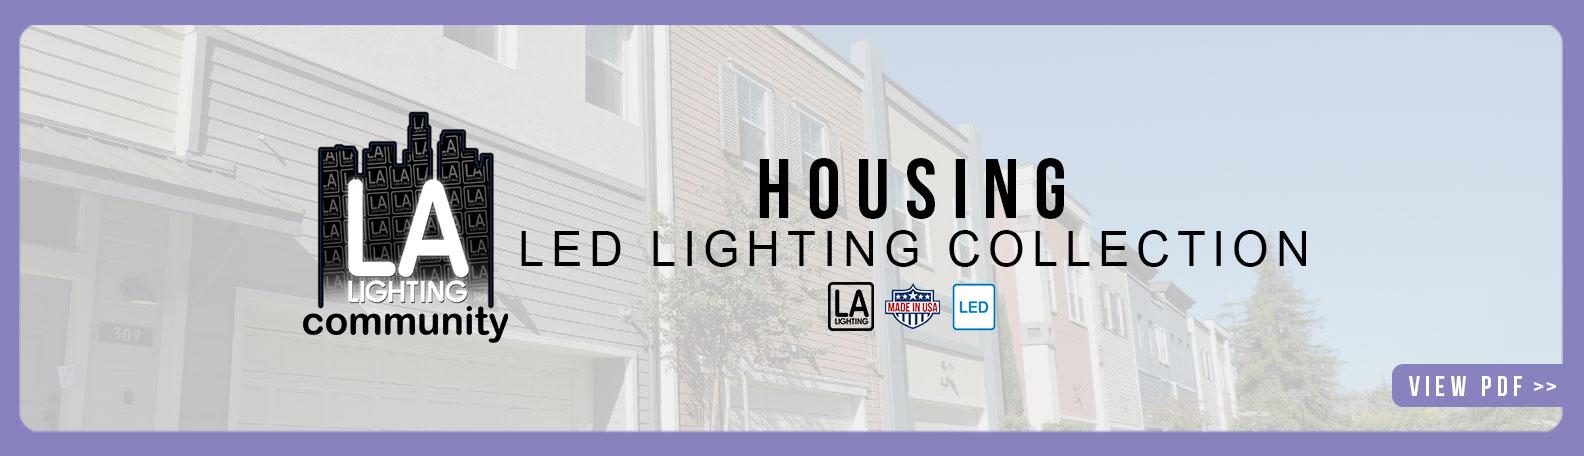 header_MAIN_housing